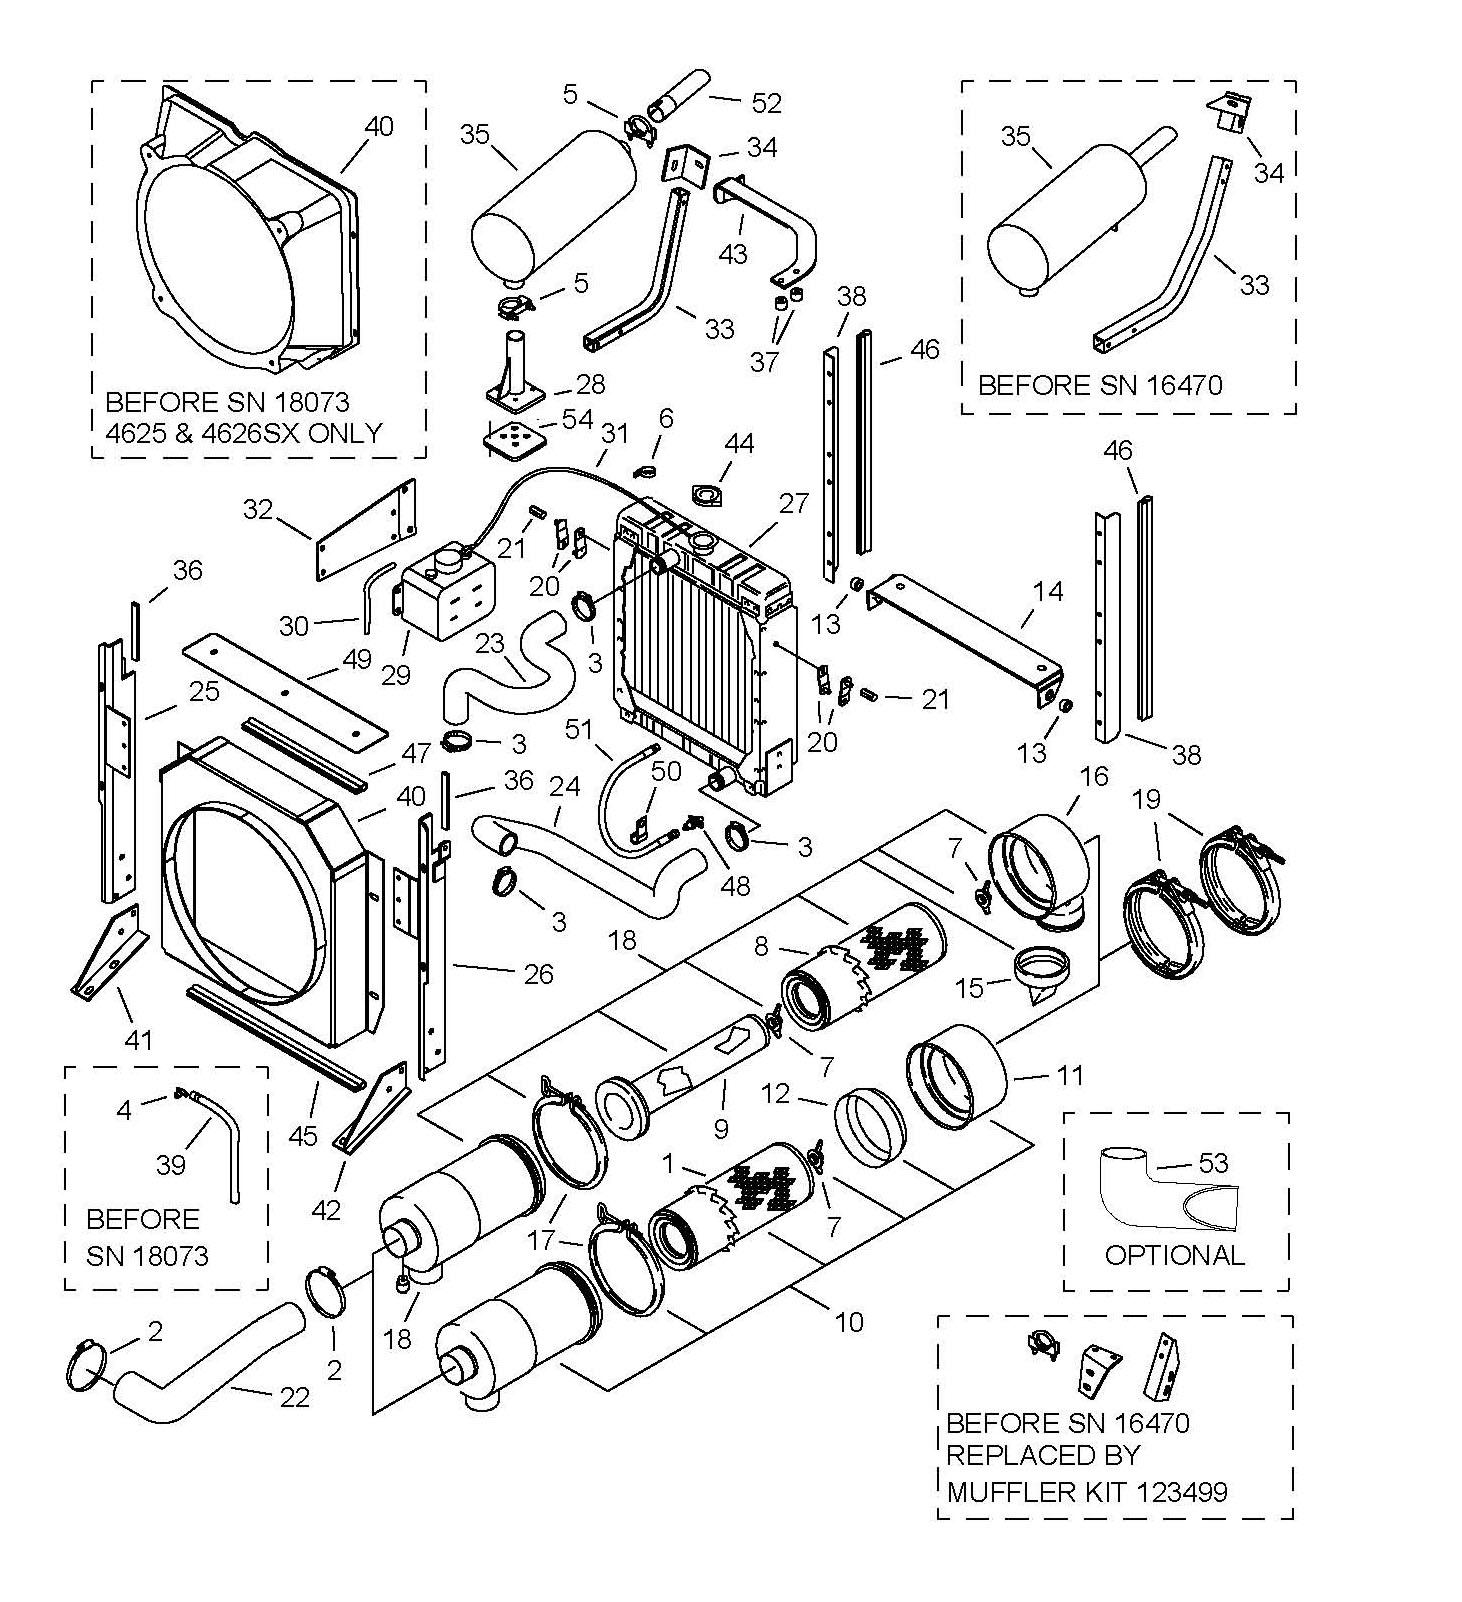 Gehl 2500 Engine Replacement